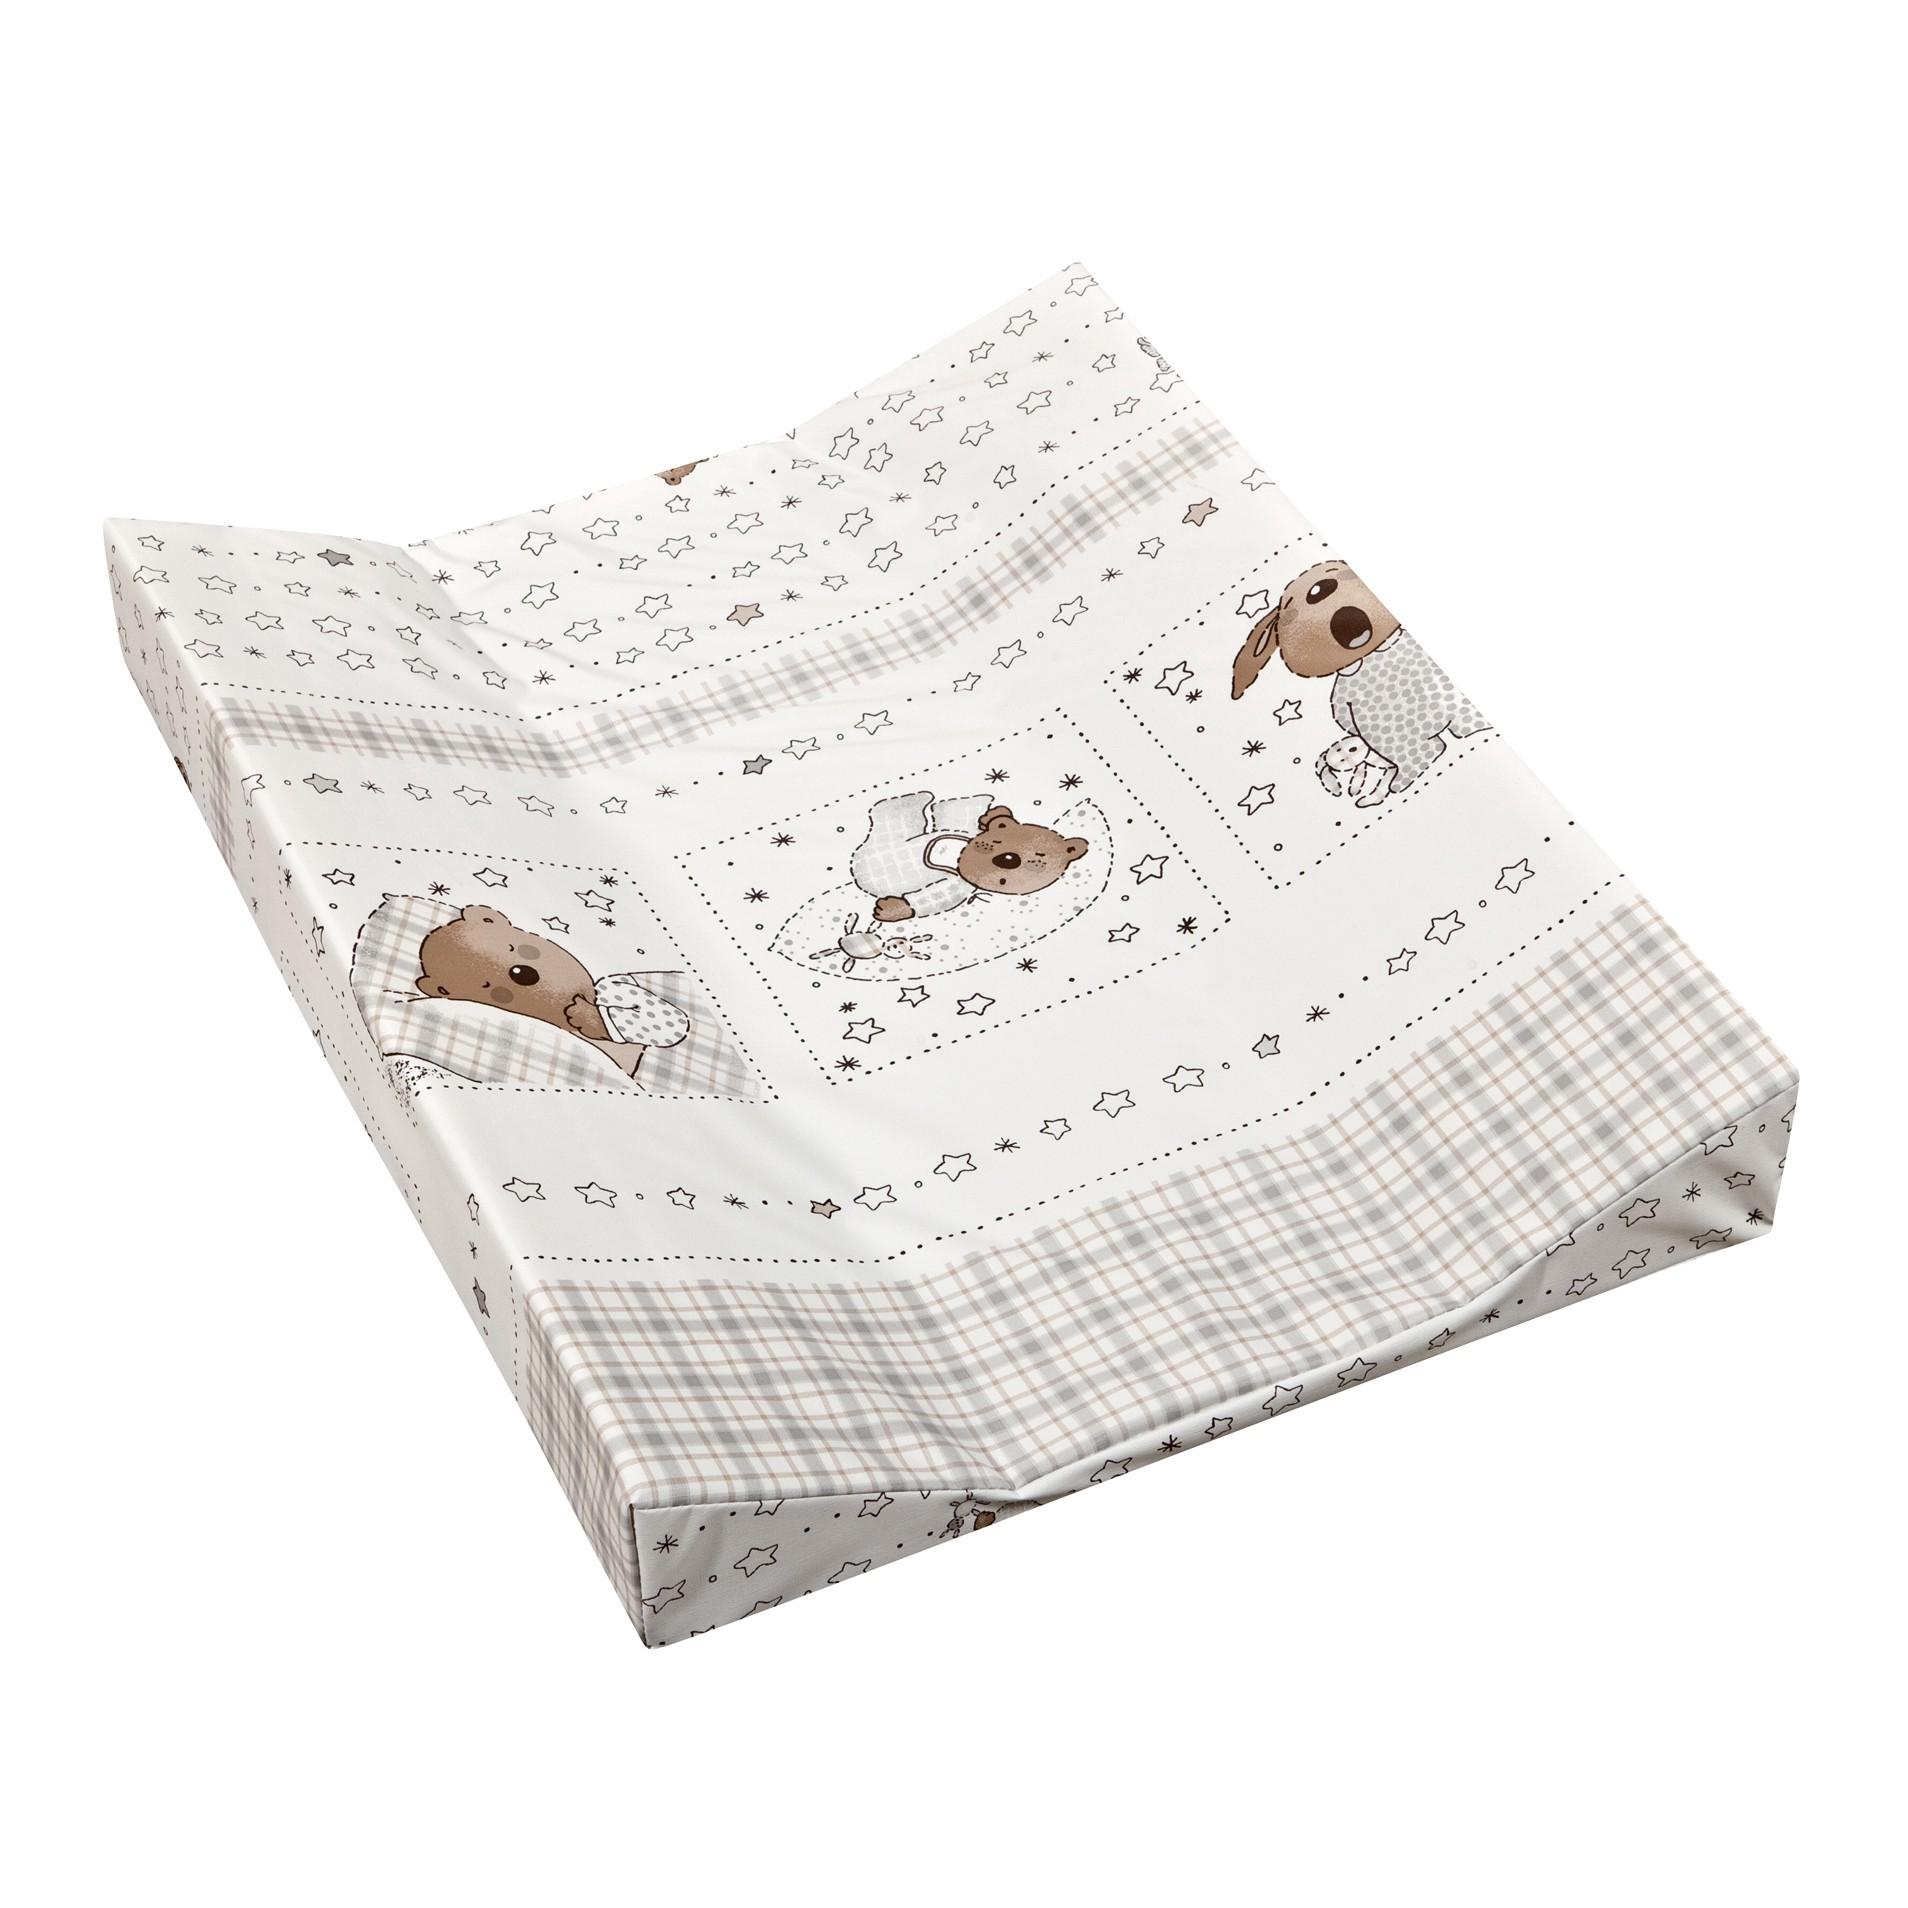 Wickelauflage Sweet Dreams - 2-Keil Mulde - Weiß mit Bärchenmotiven